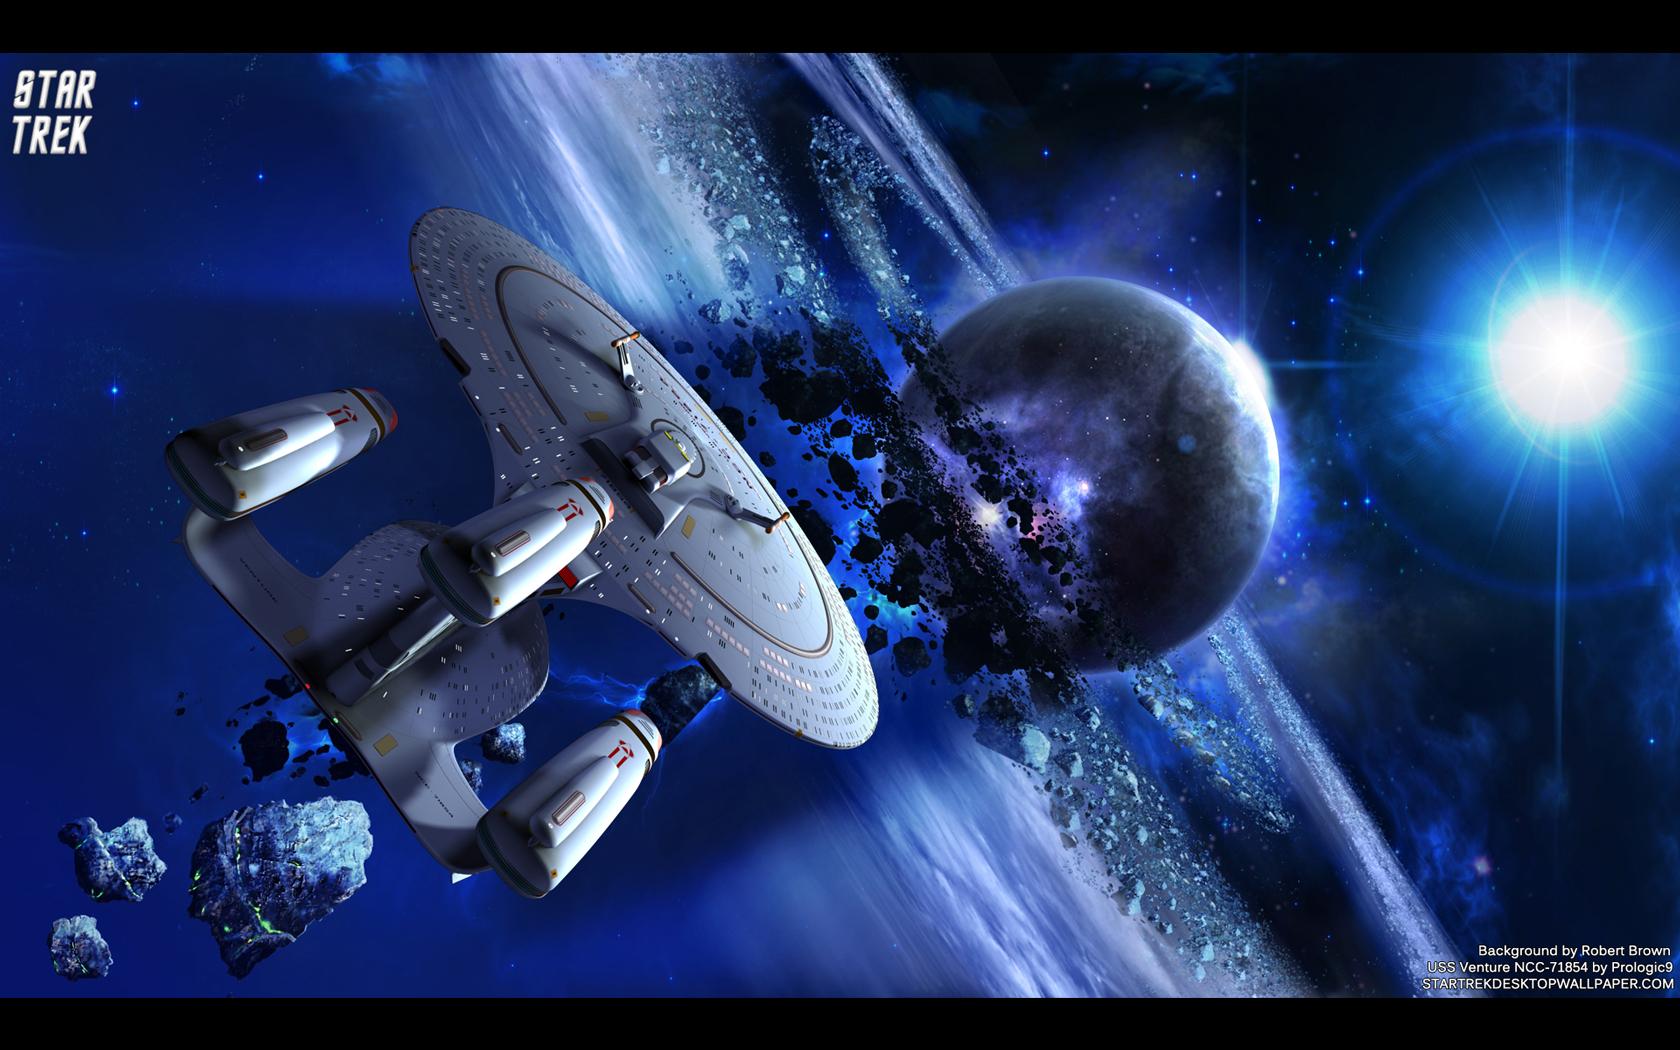 49 Star Trek Live Wallpaper On Wallpapersafari